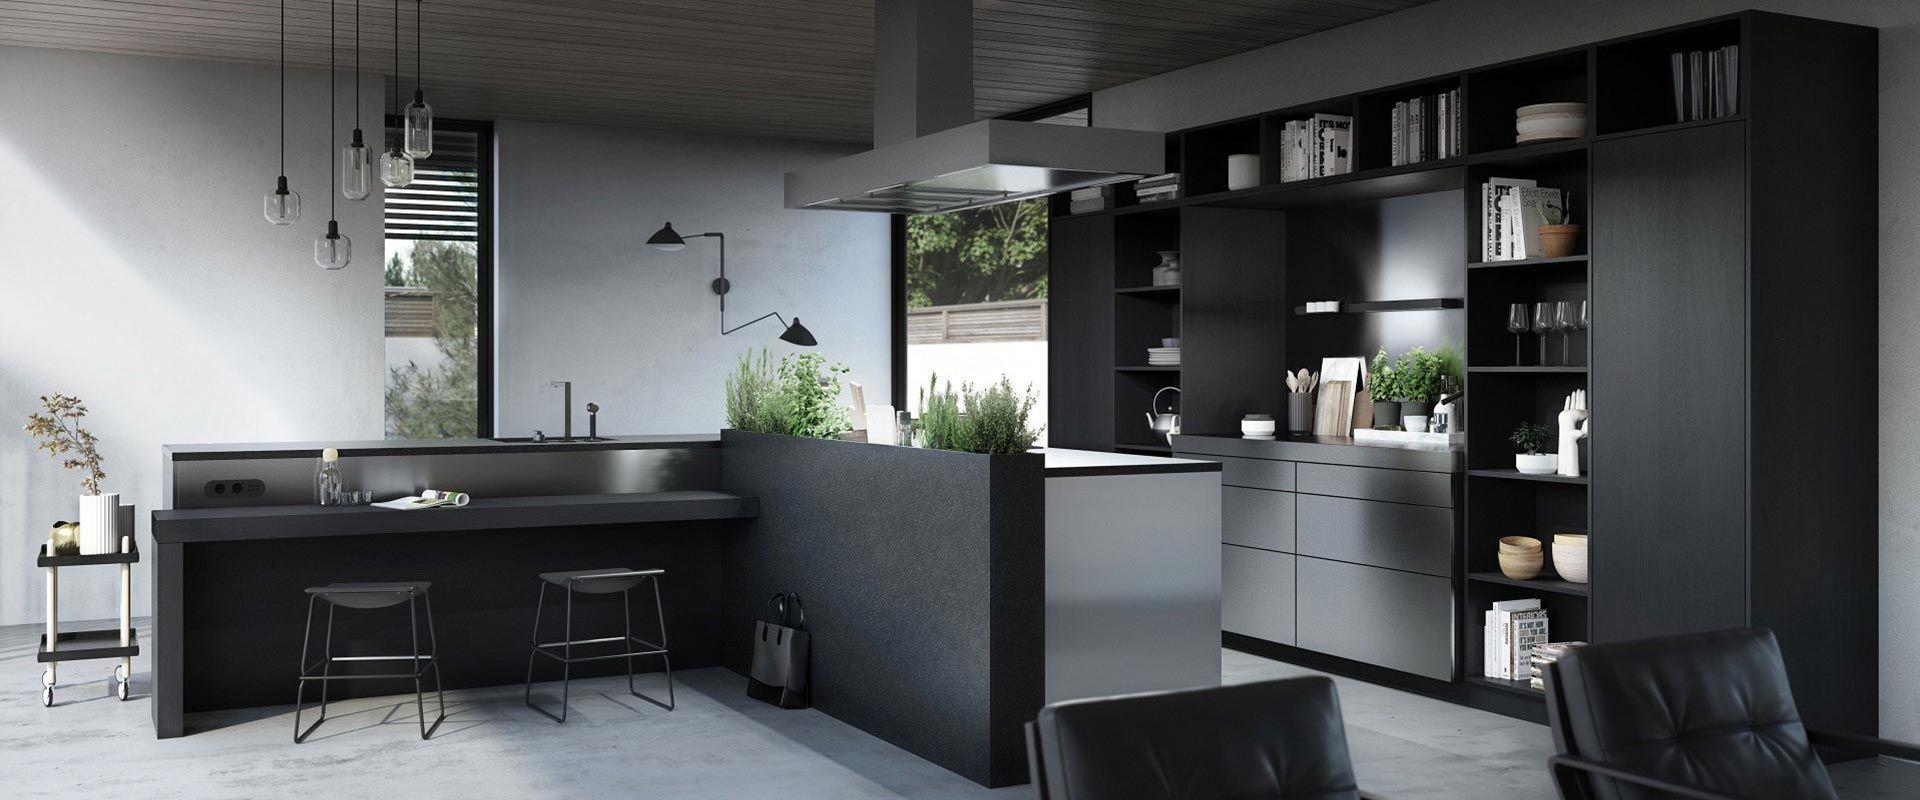 Zwarte keuken SieMatic Urban